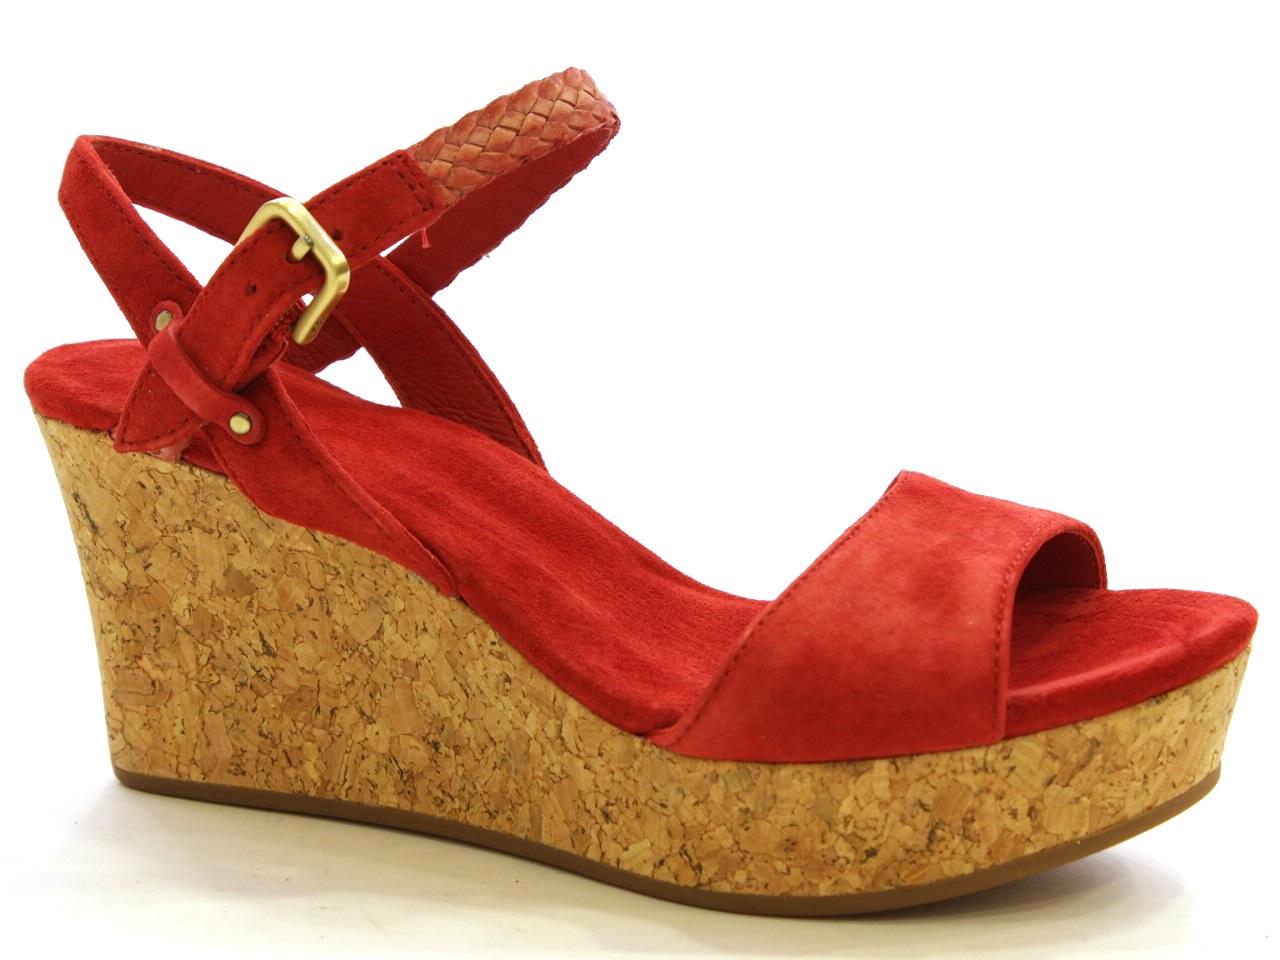 Wedge Sandals Ugg - 478 1005104